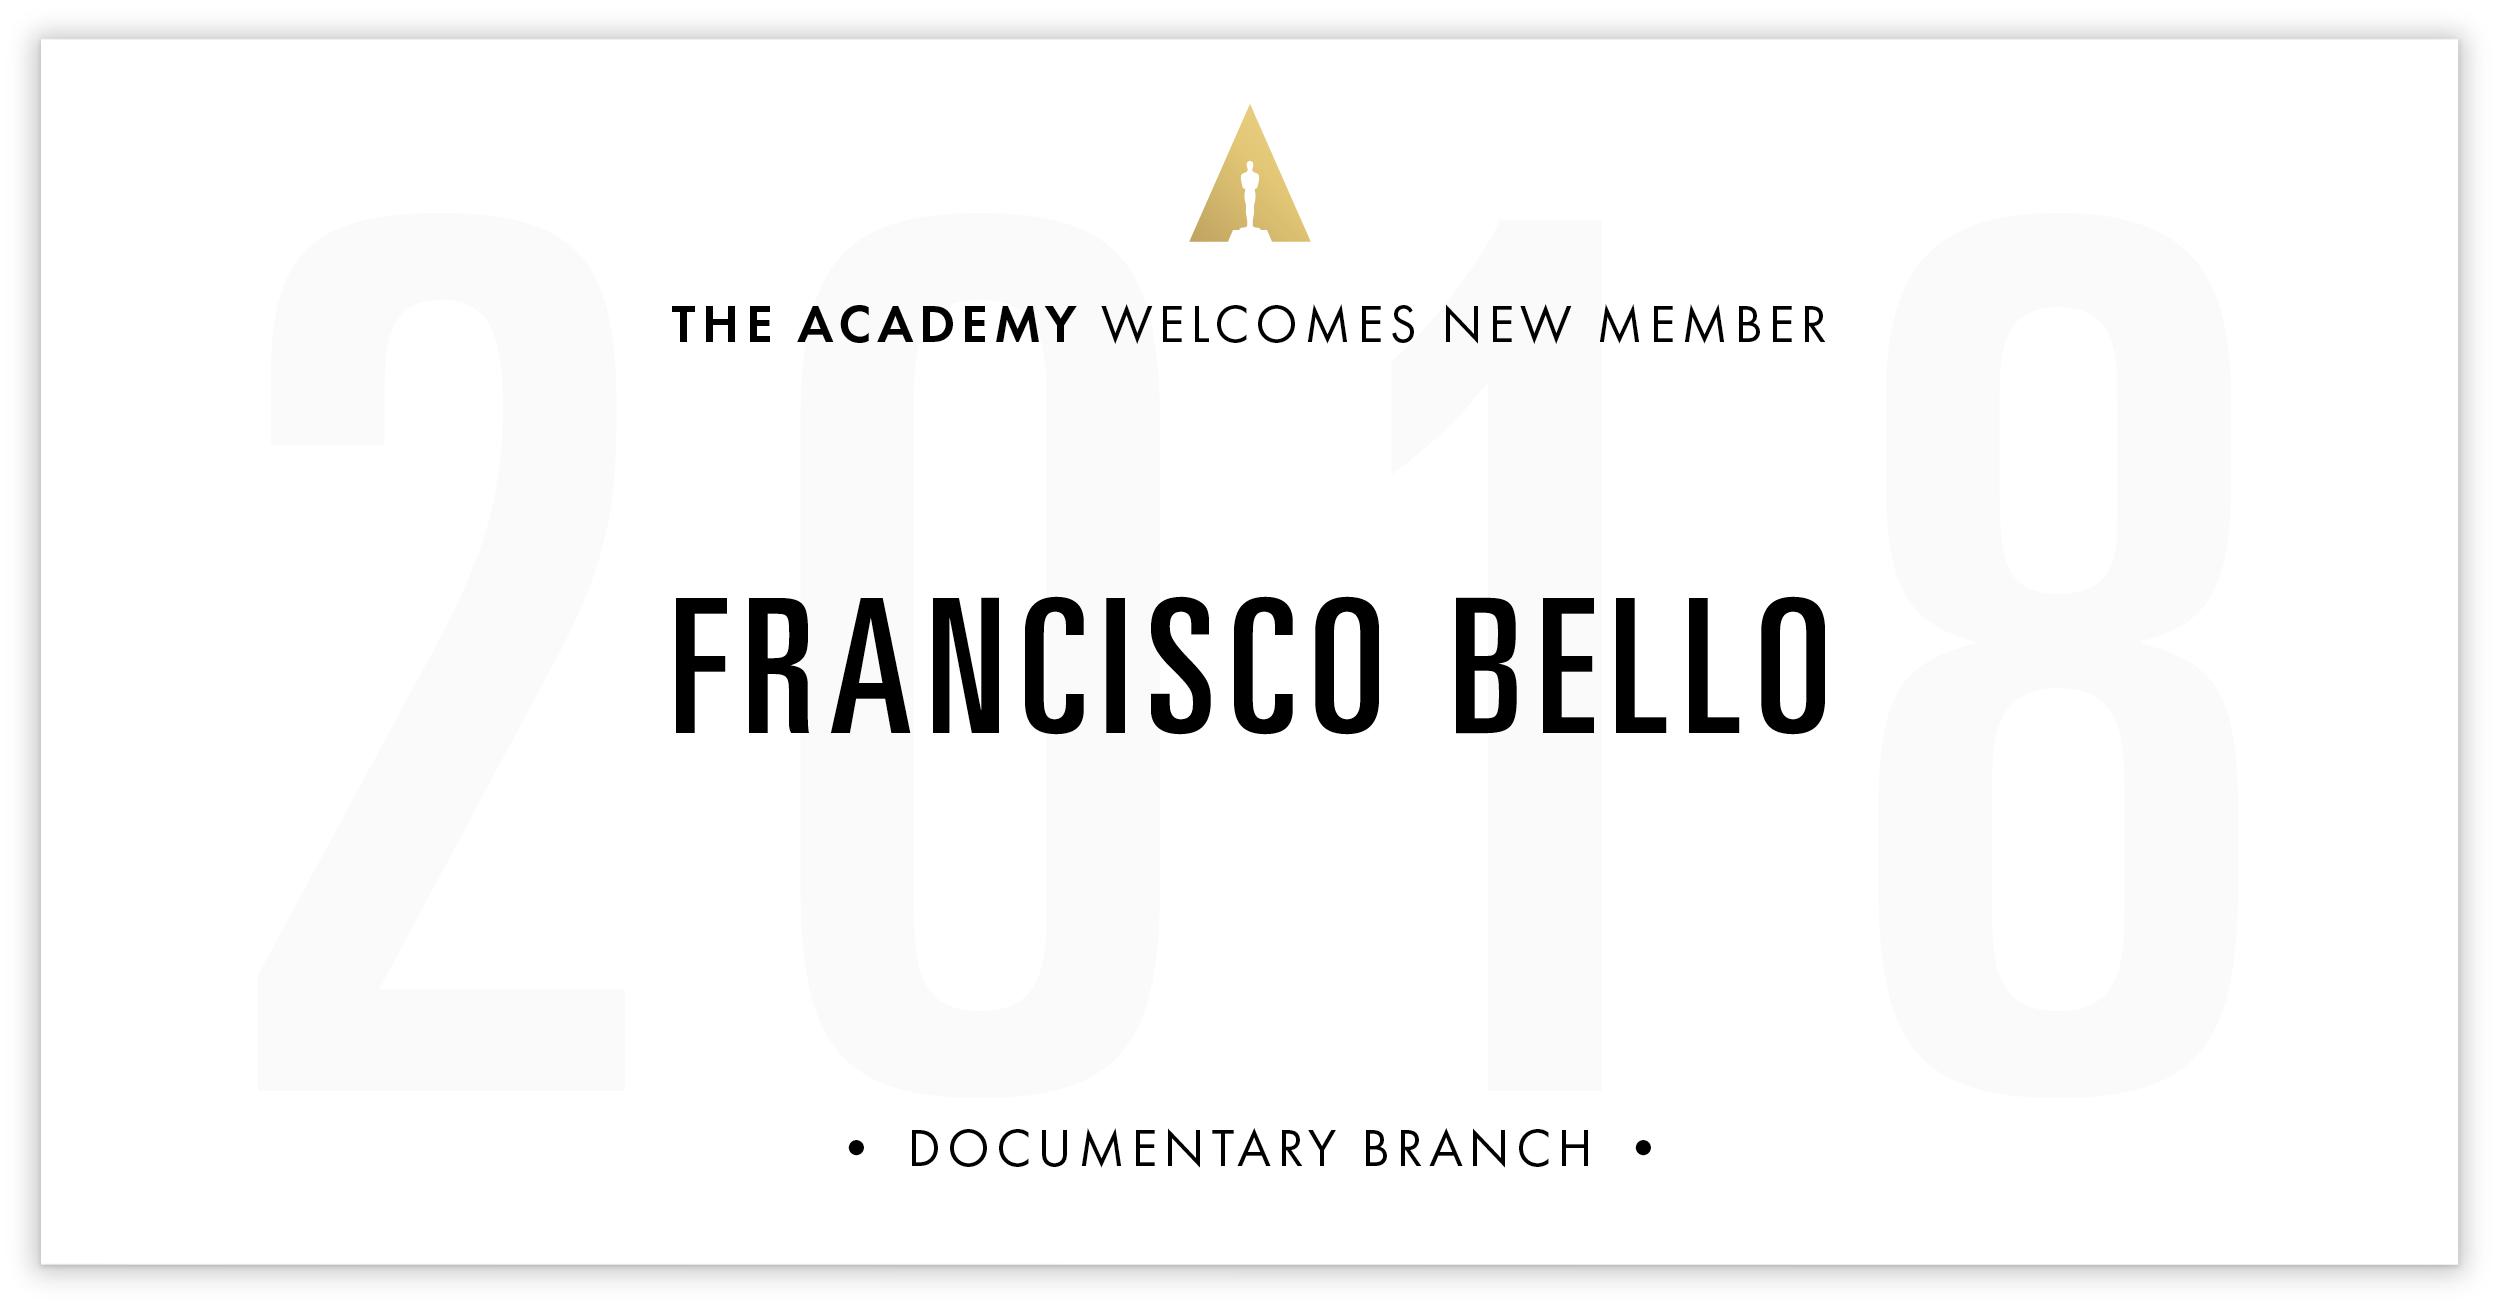 Francisco Bello is invited!